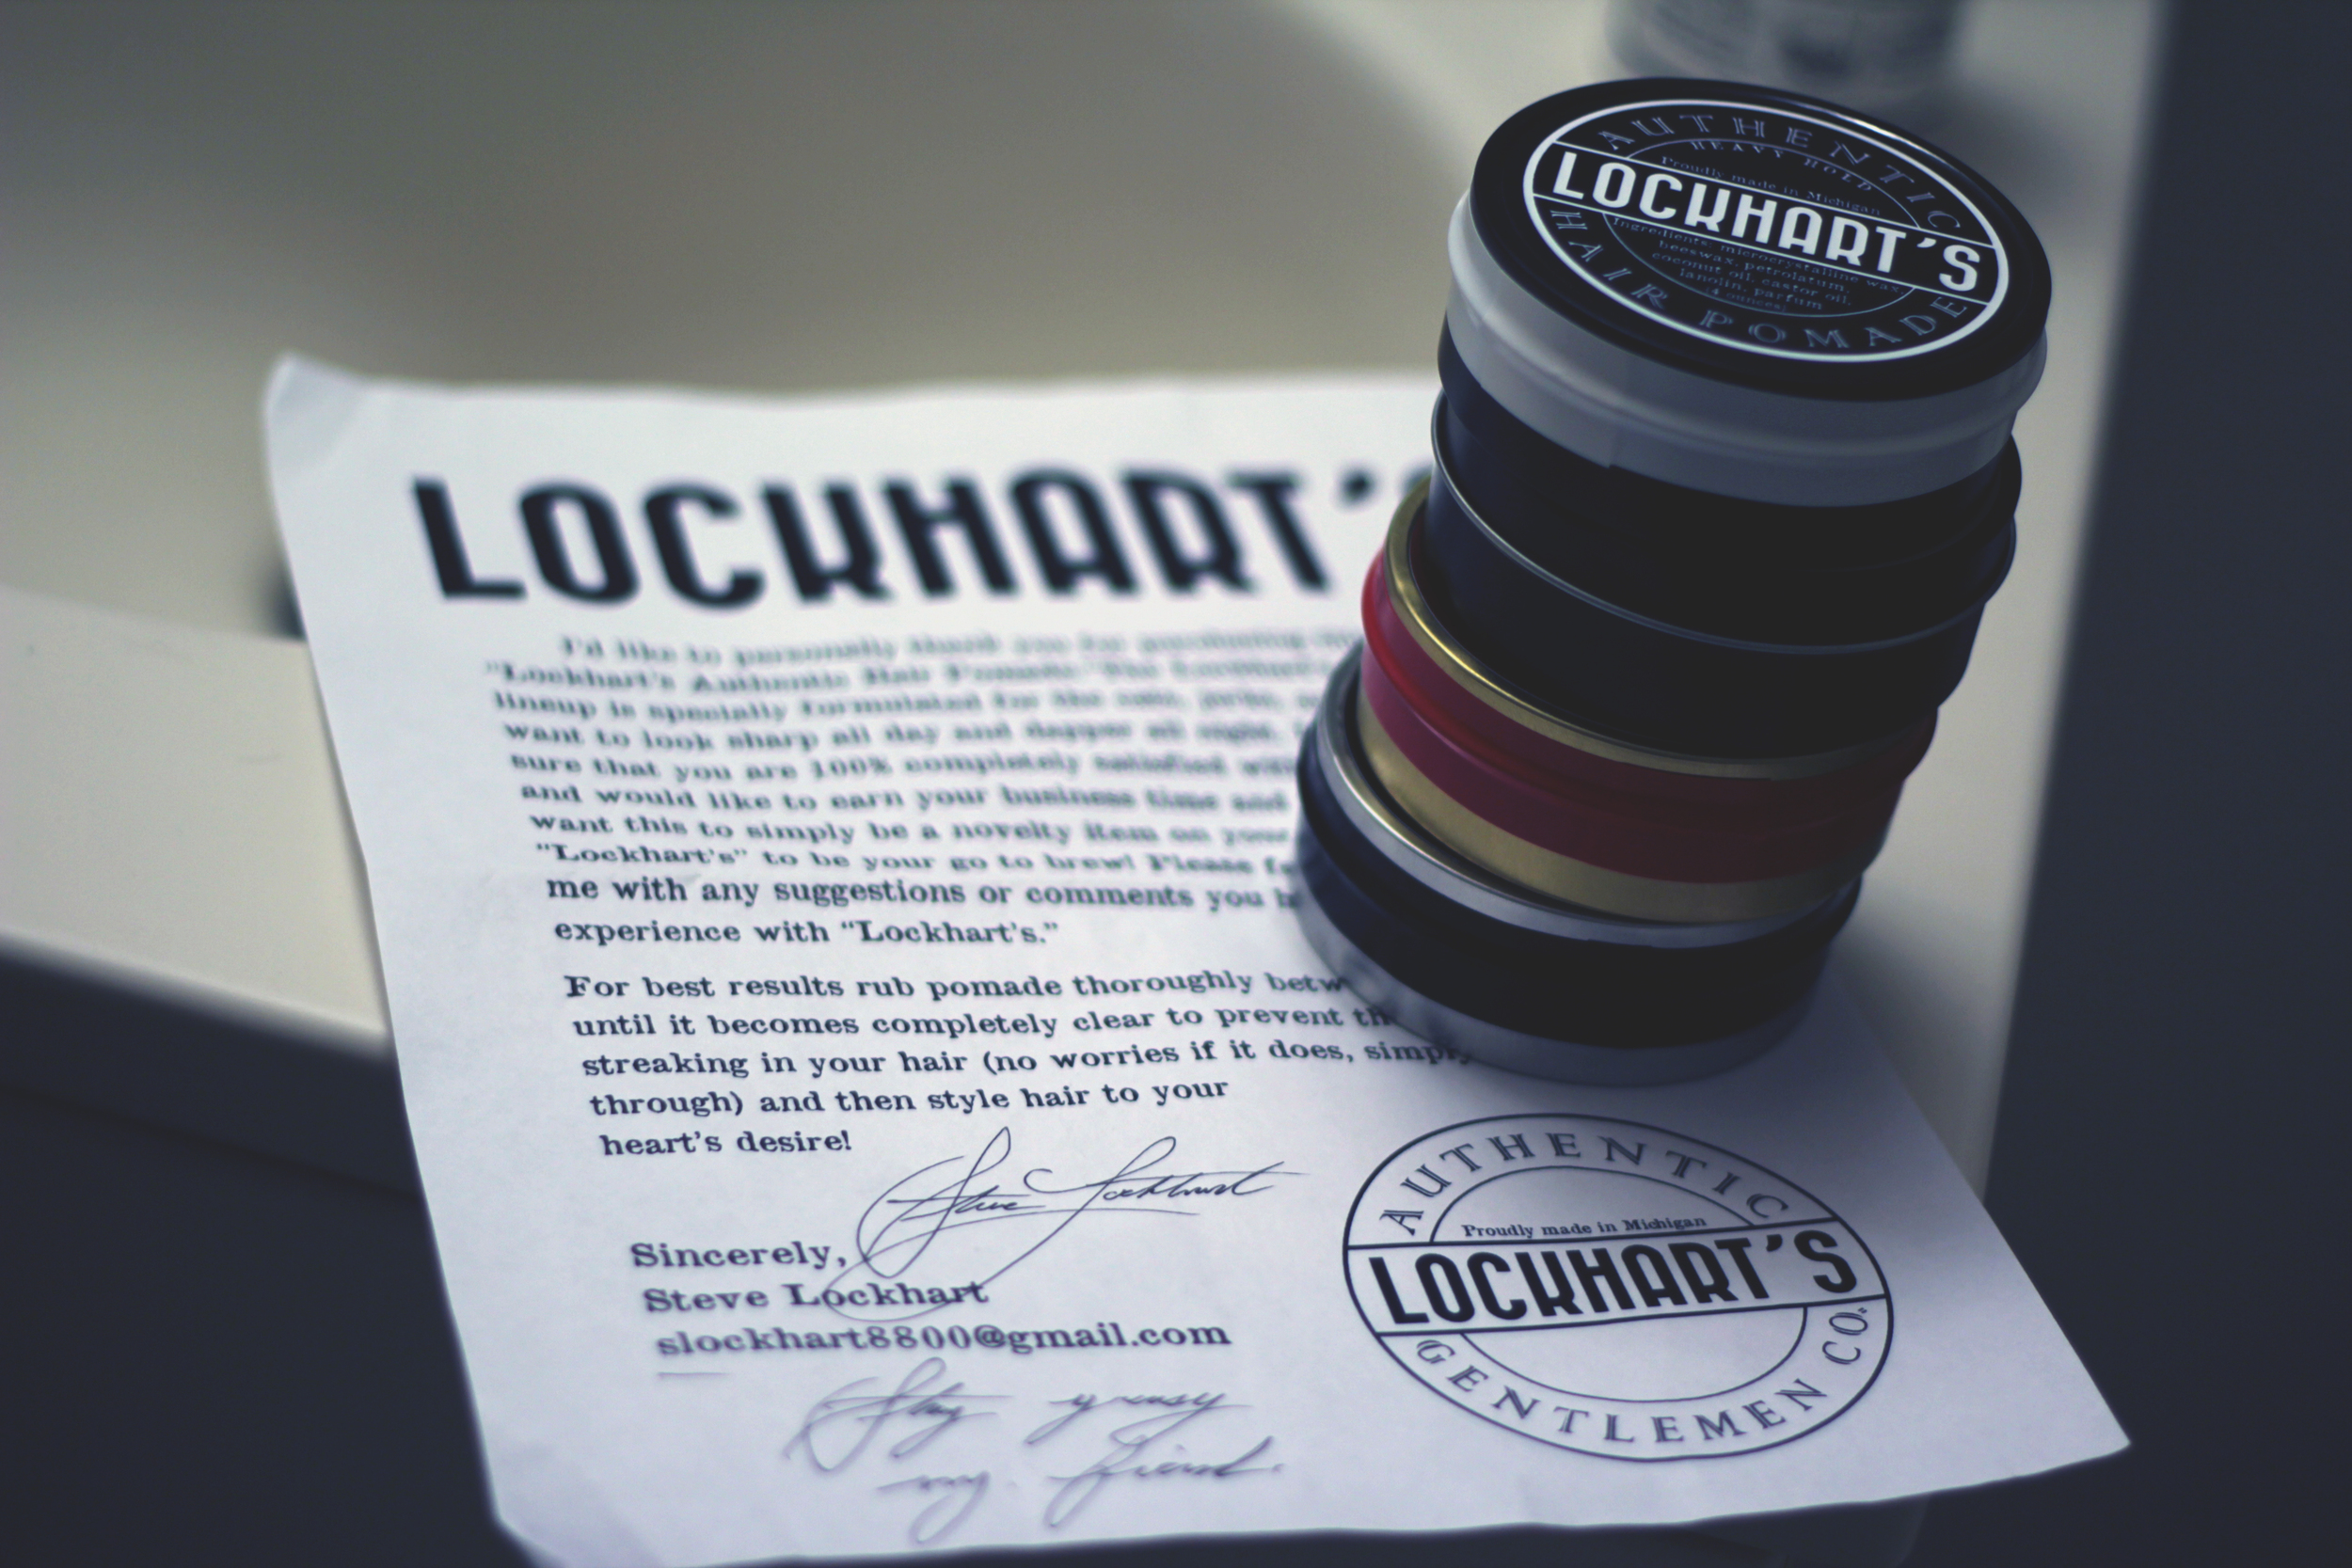 Lockhart's Authentic Hair Pomade jars